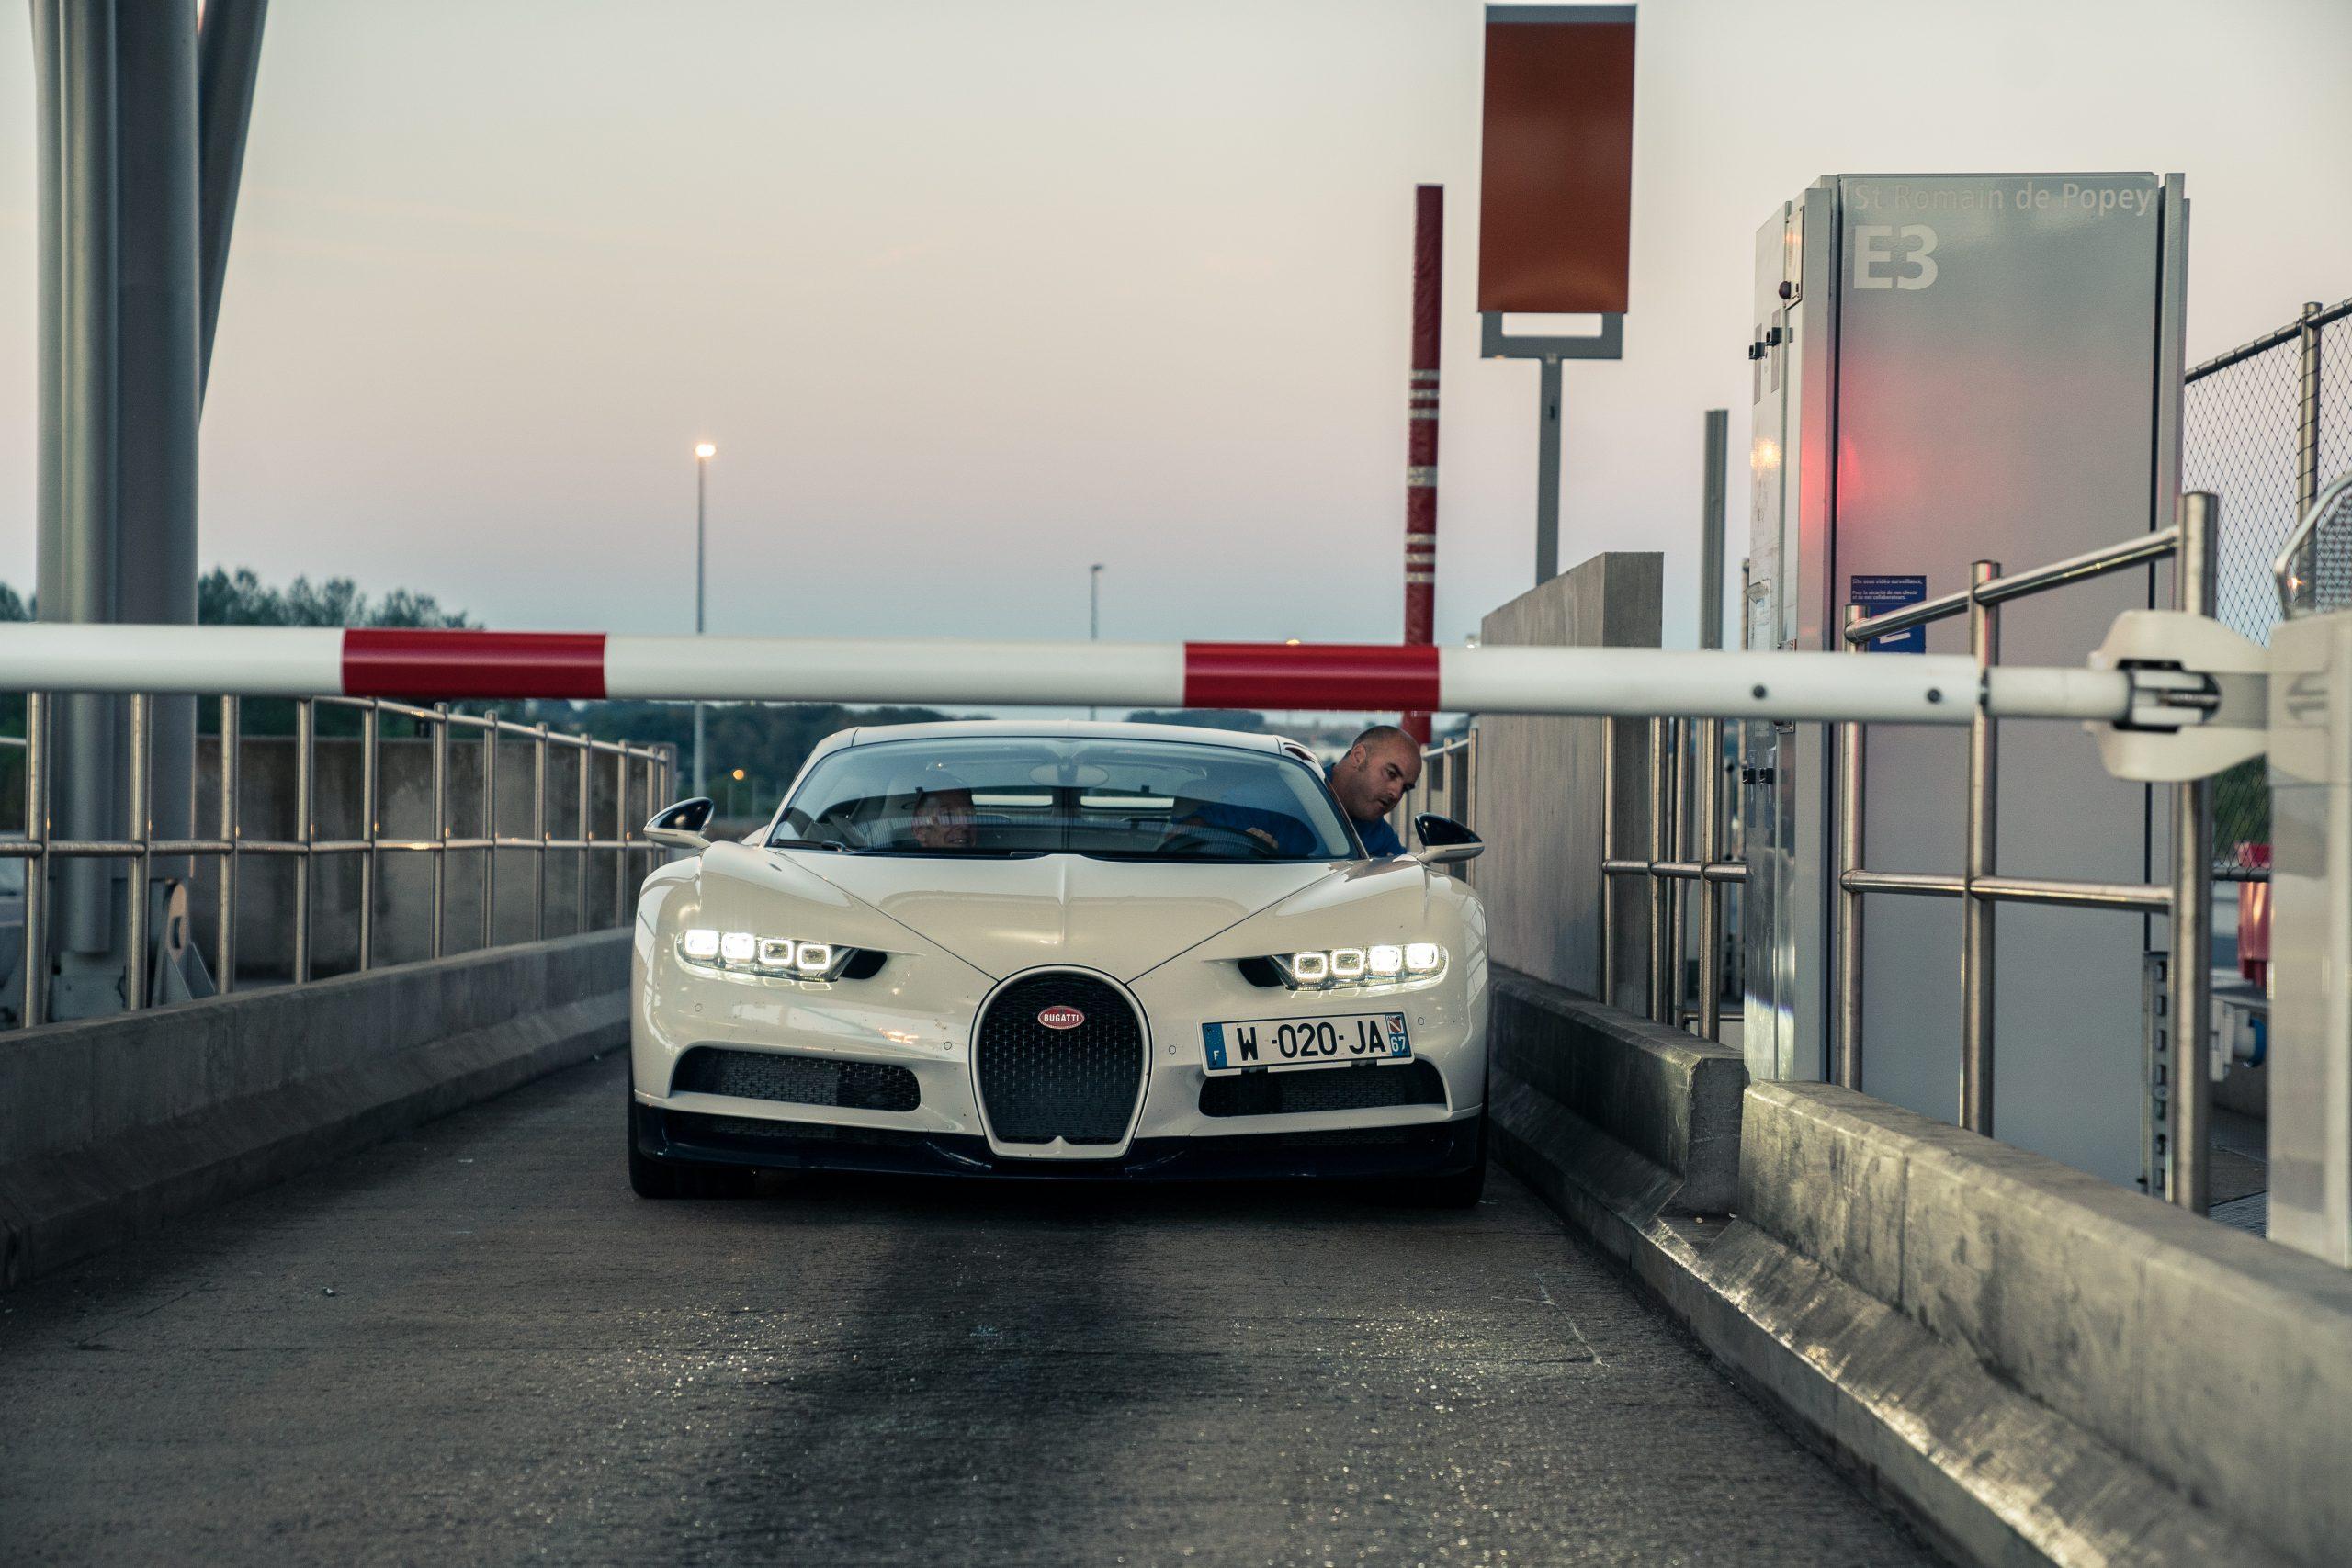 Bugatti Chiron bij tolpoortje (en slagboom) in Frankrijk